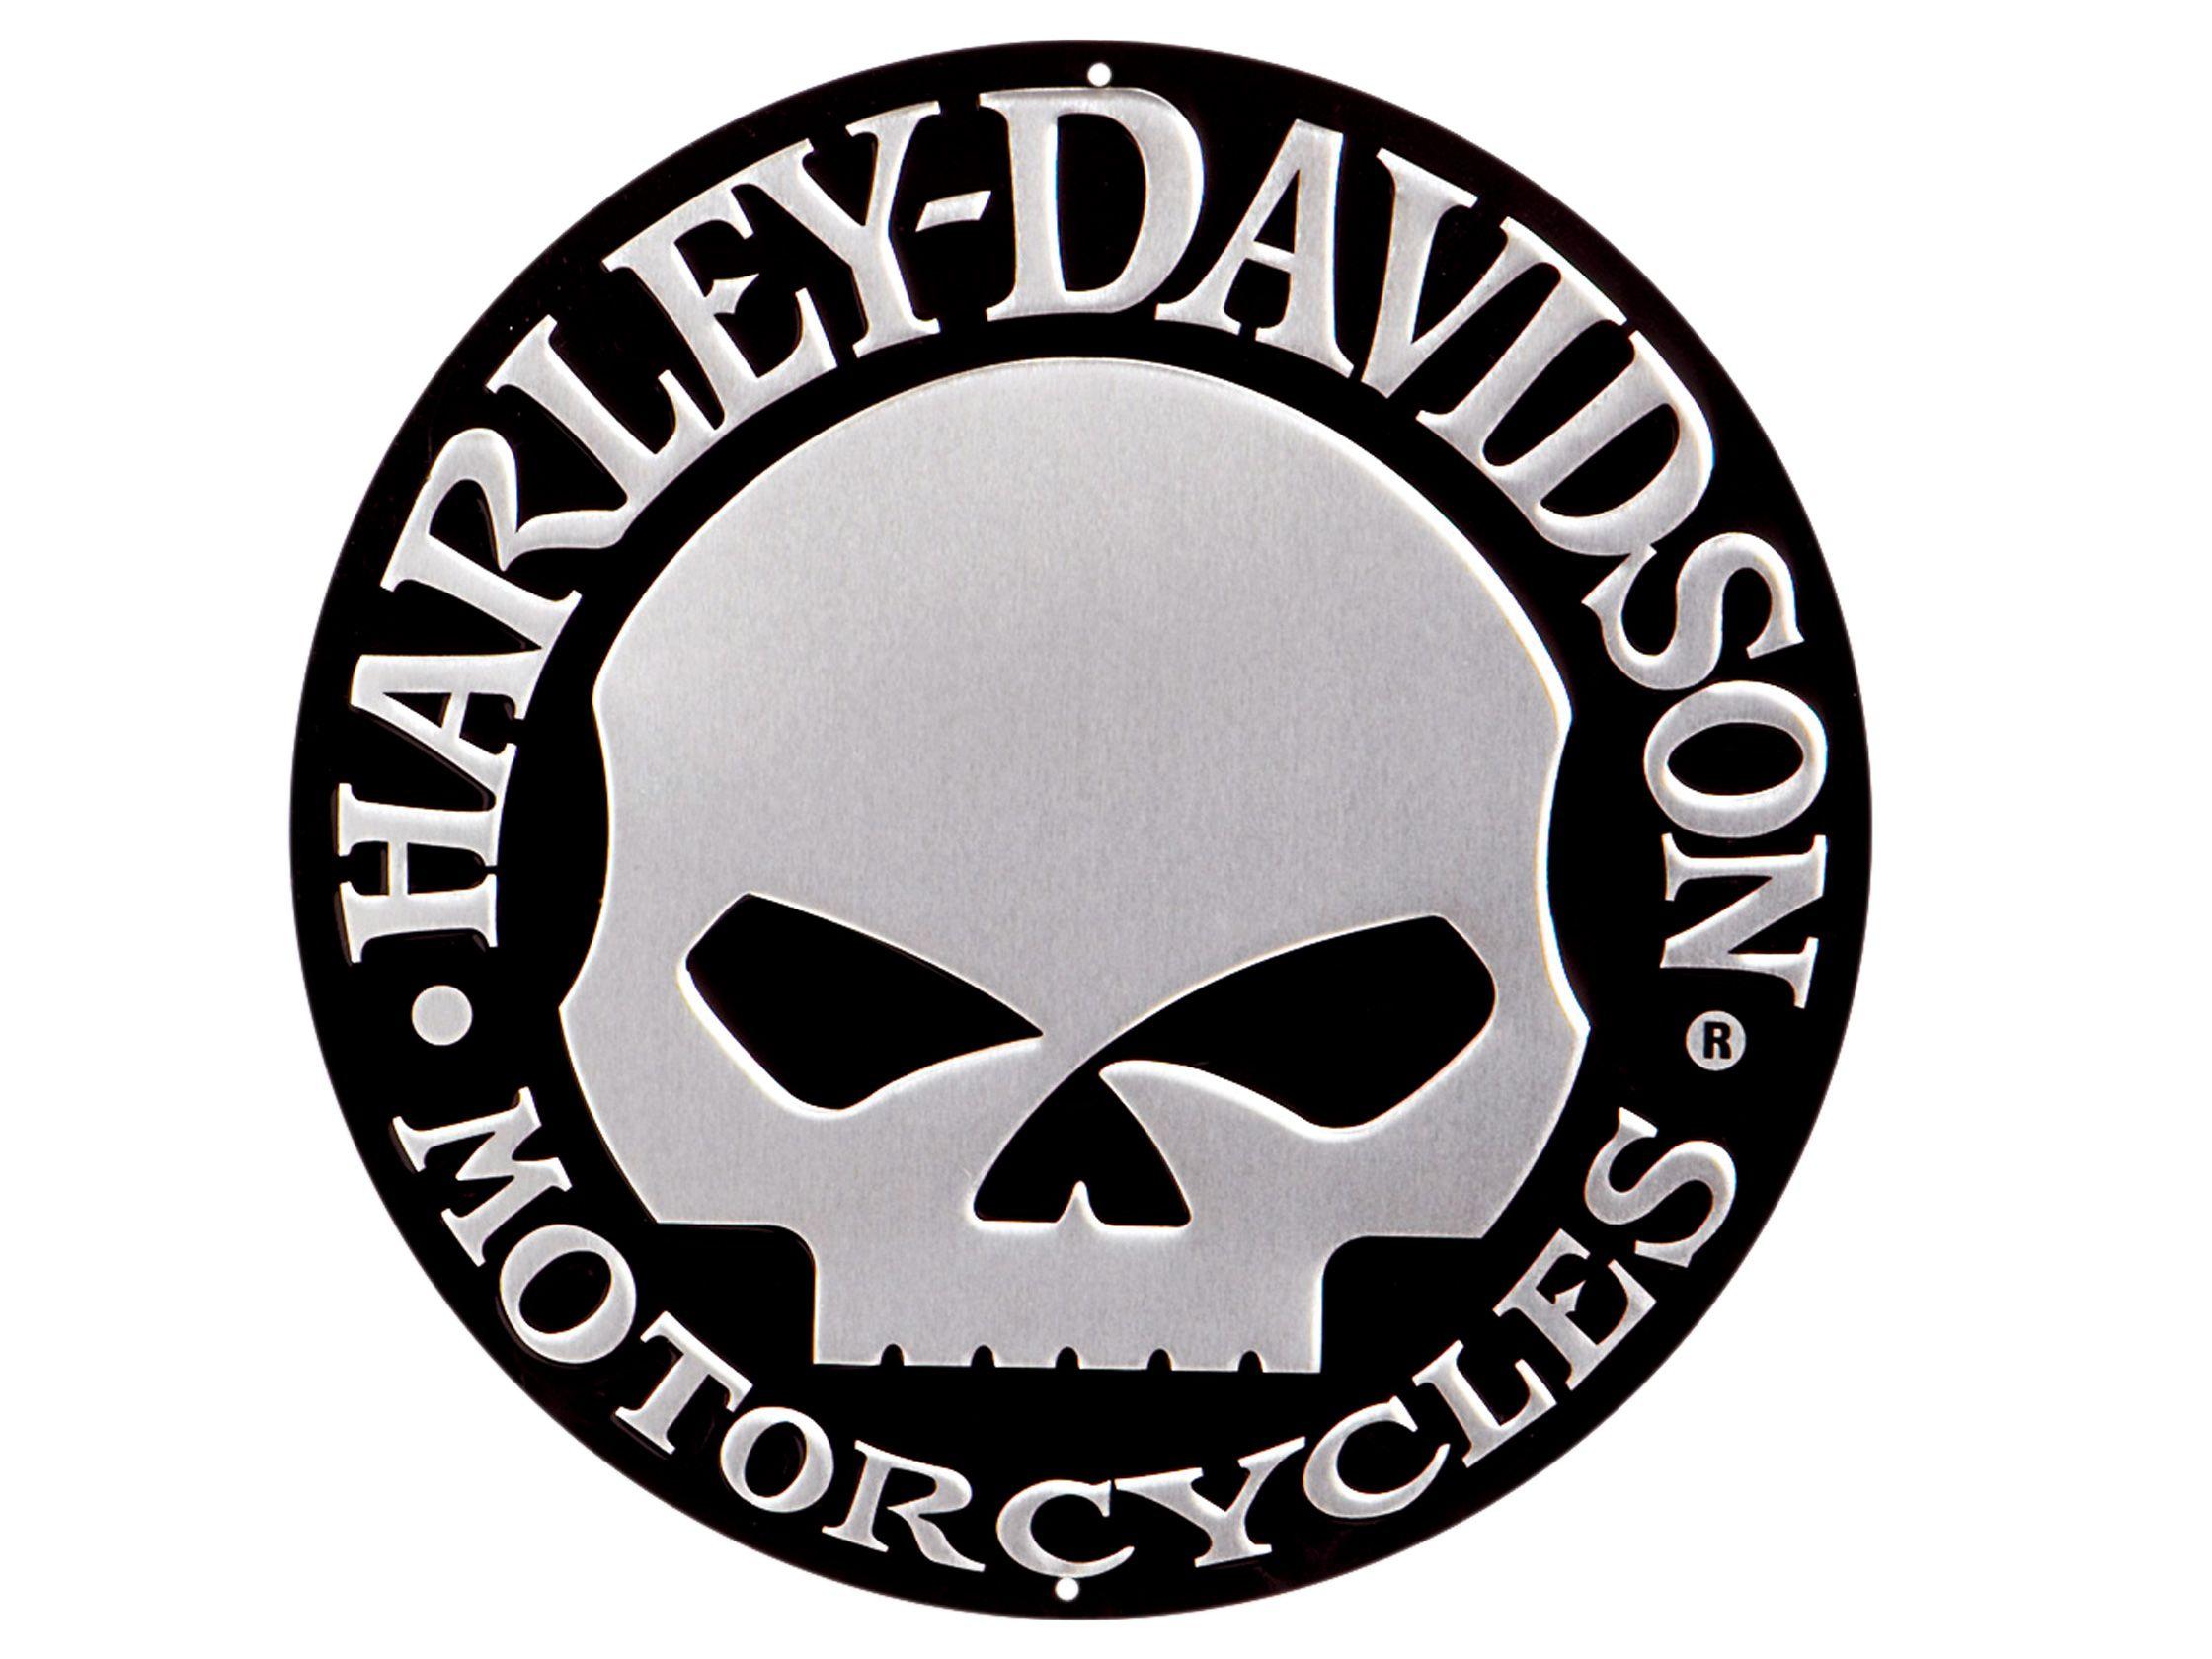 harley davidson number 1 skull logo background 1 hd wallpapers tee rh pinterest com harley davidson 1 logo with skull harley davidson 1 logo with skull